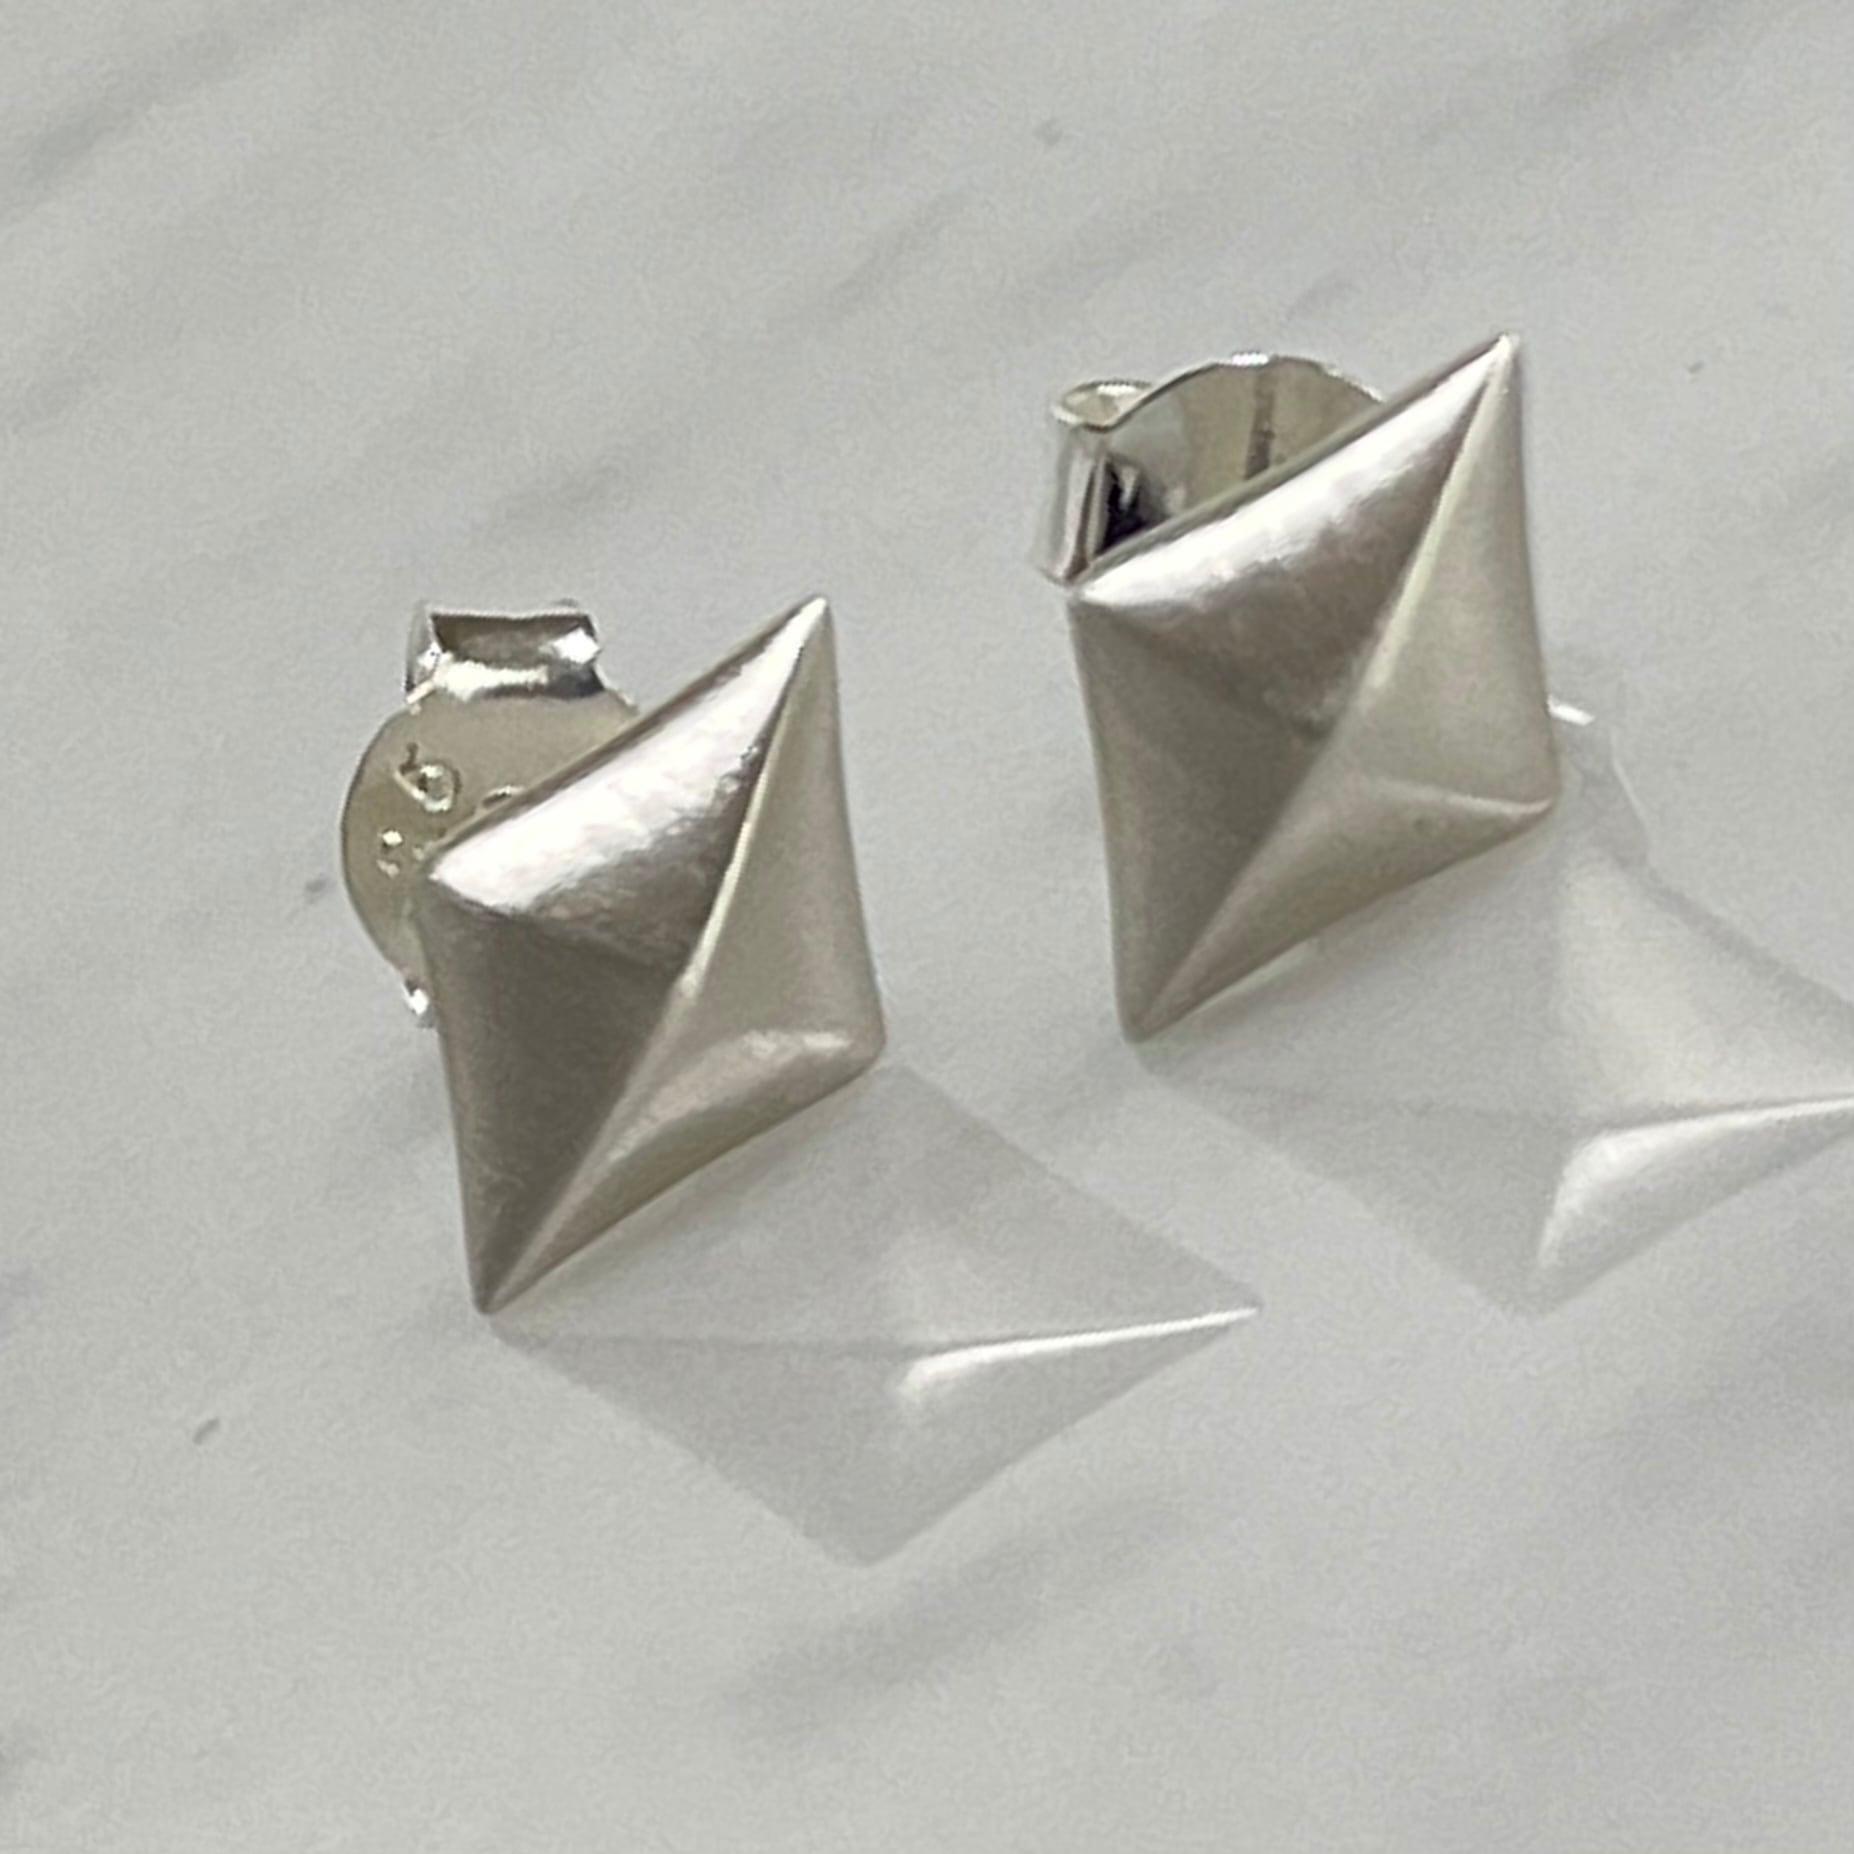 CME-8 Dia Stud Earrings